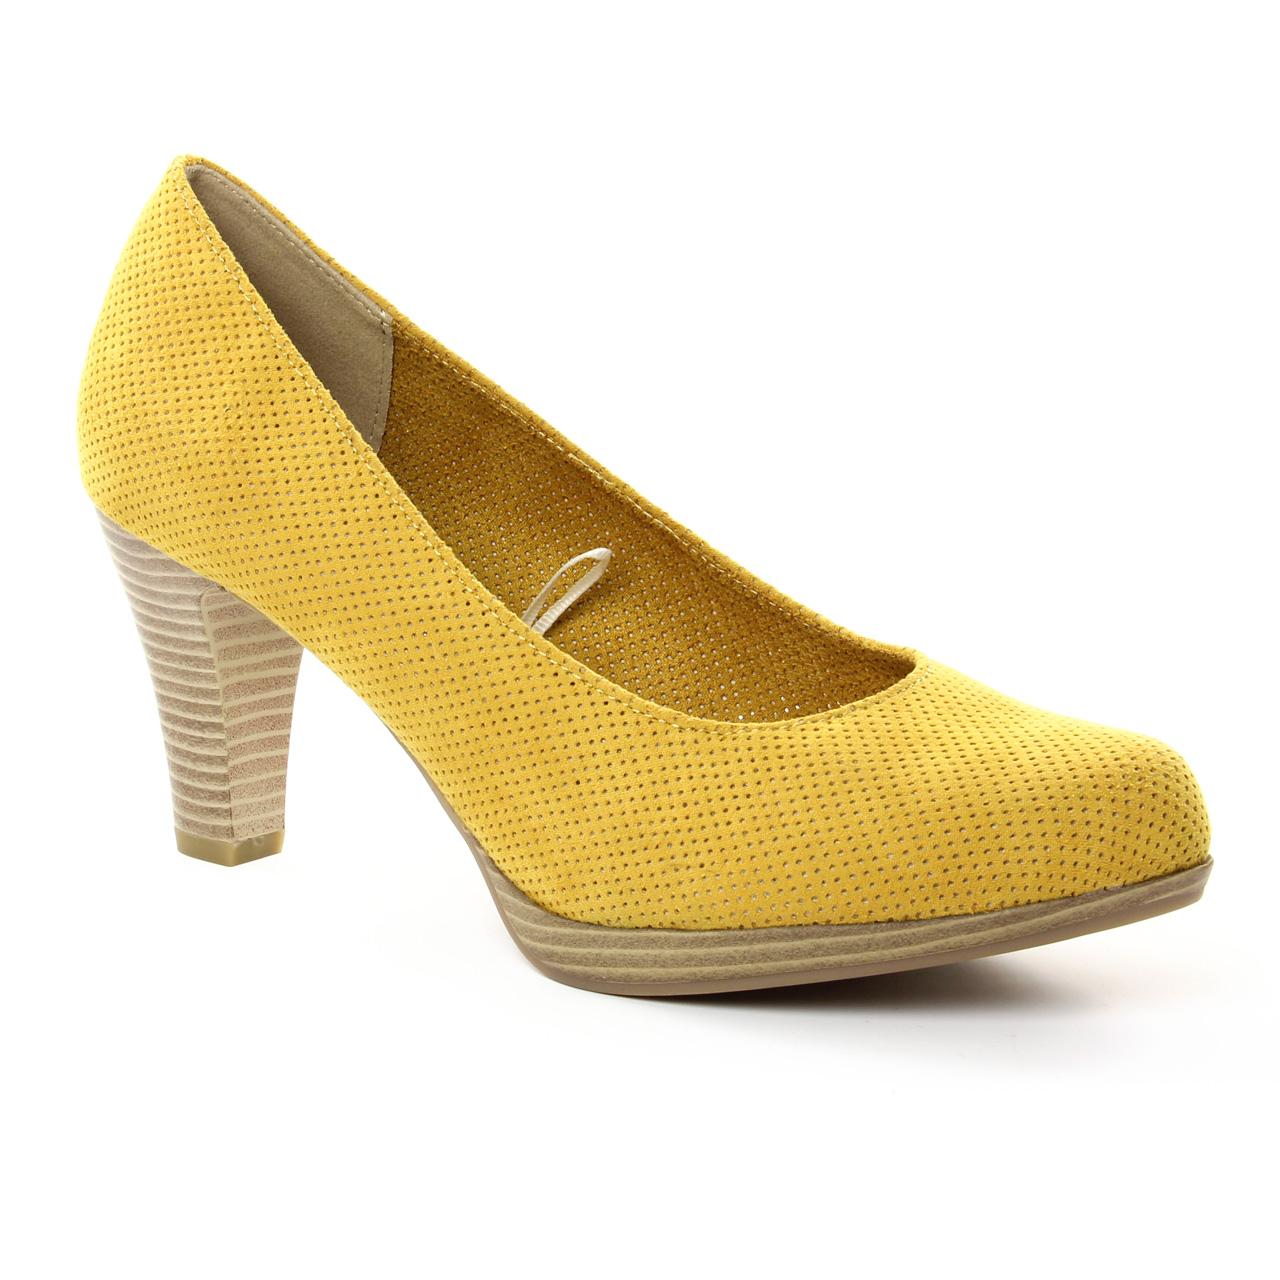 Chaussures Marco Tozzi Cool Club jaunes fille e0hU9vQ